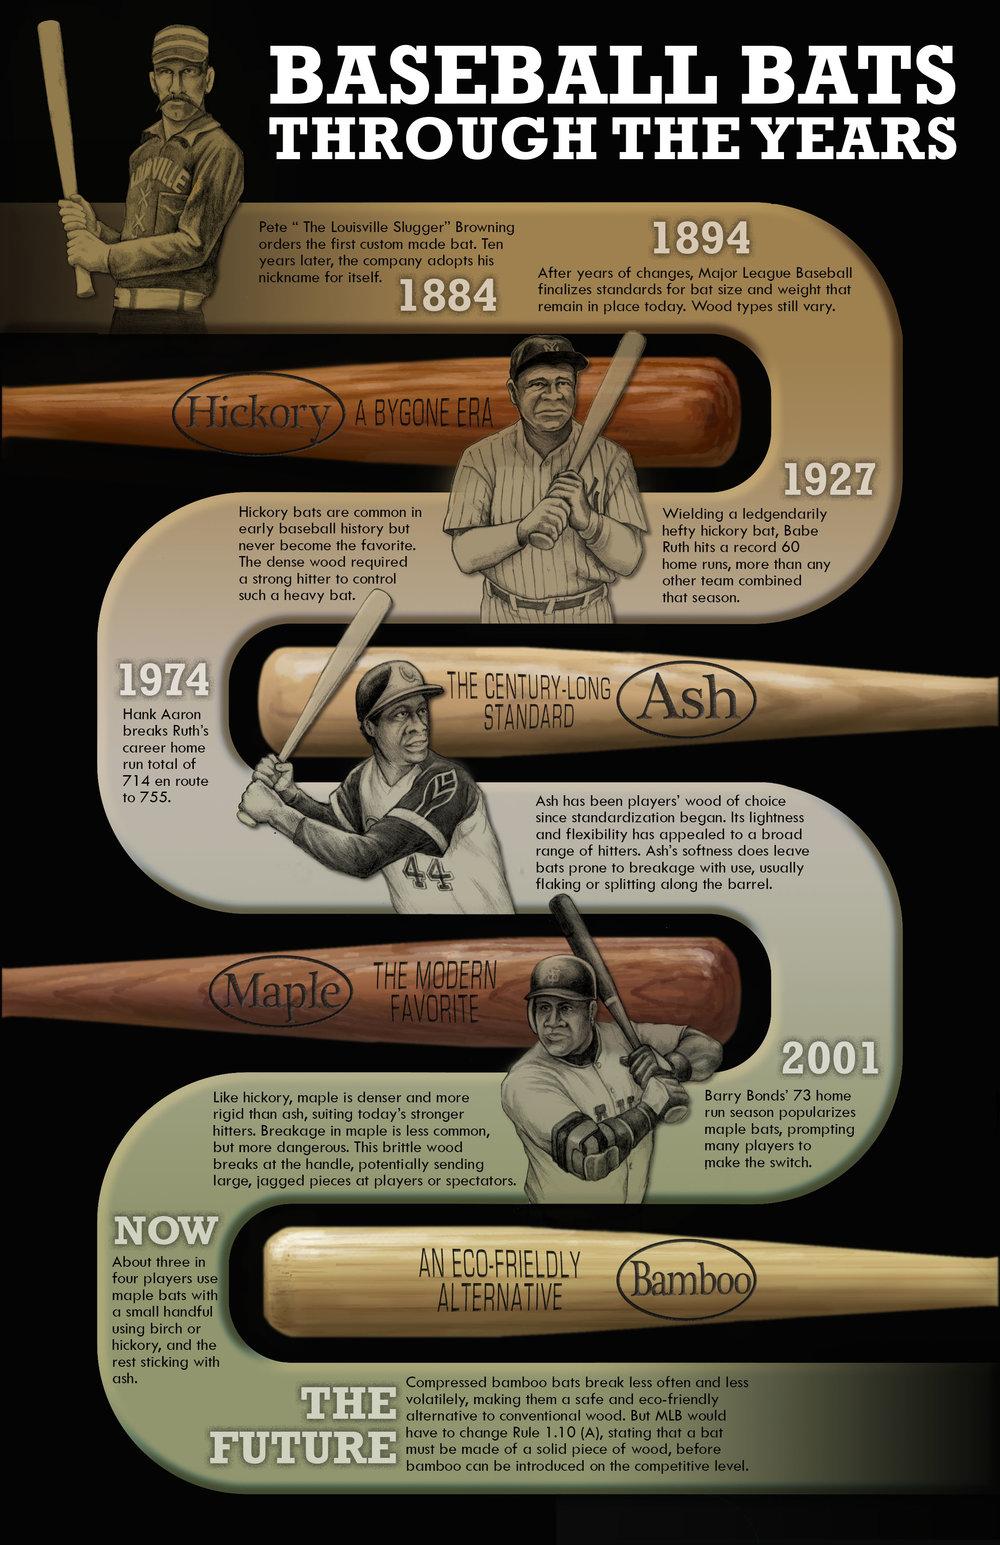 Baseball Bats Through the Years